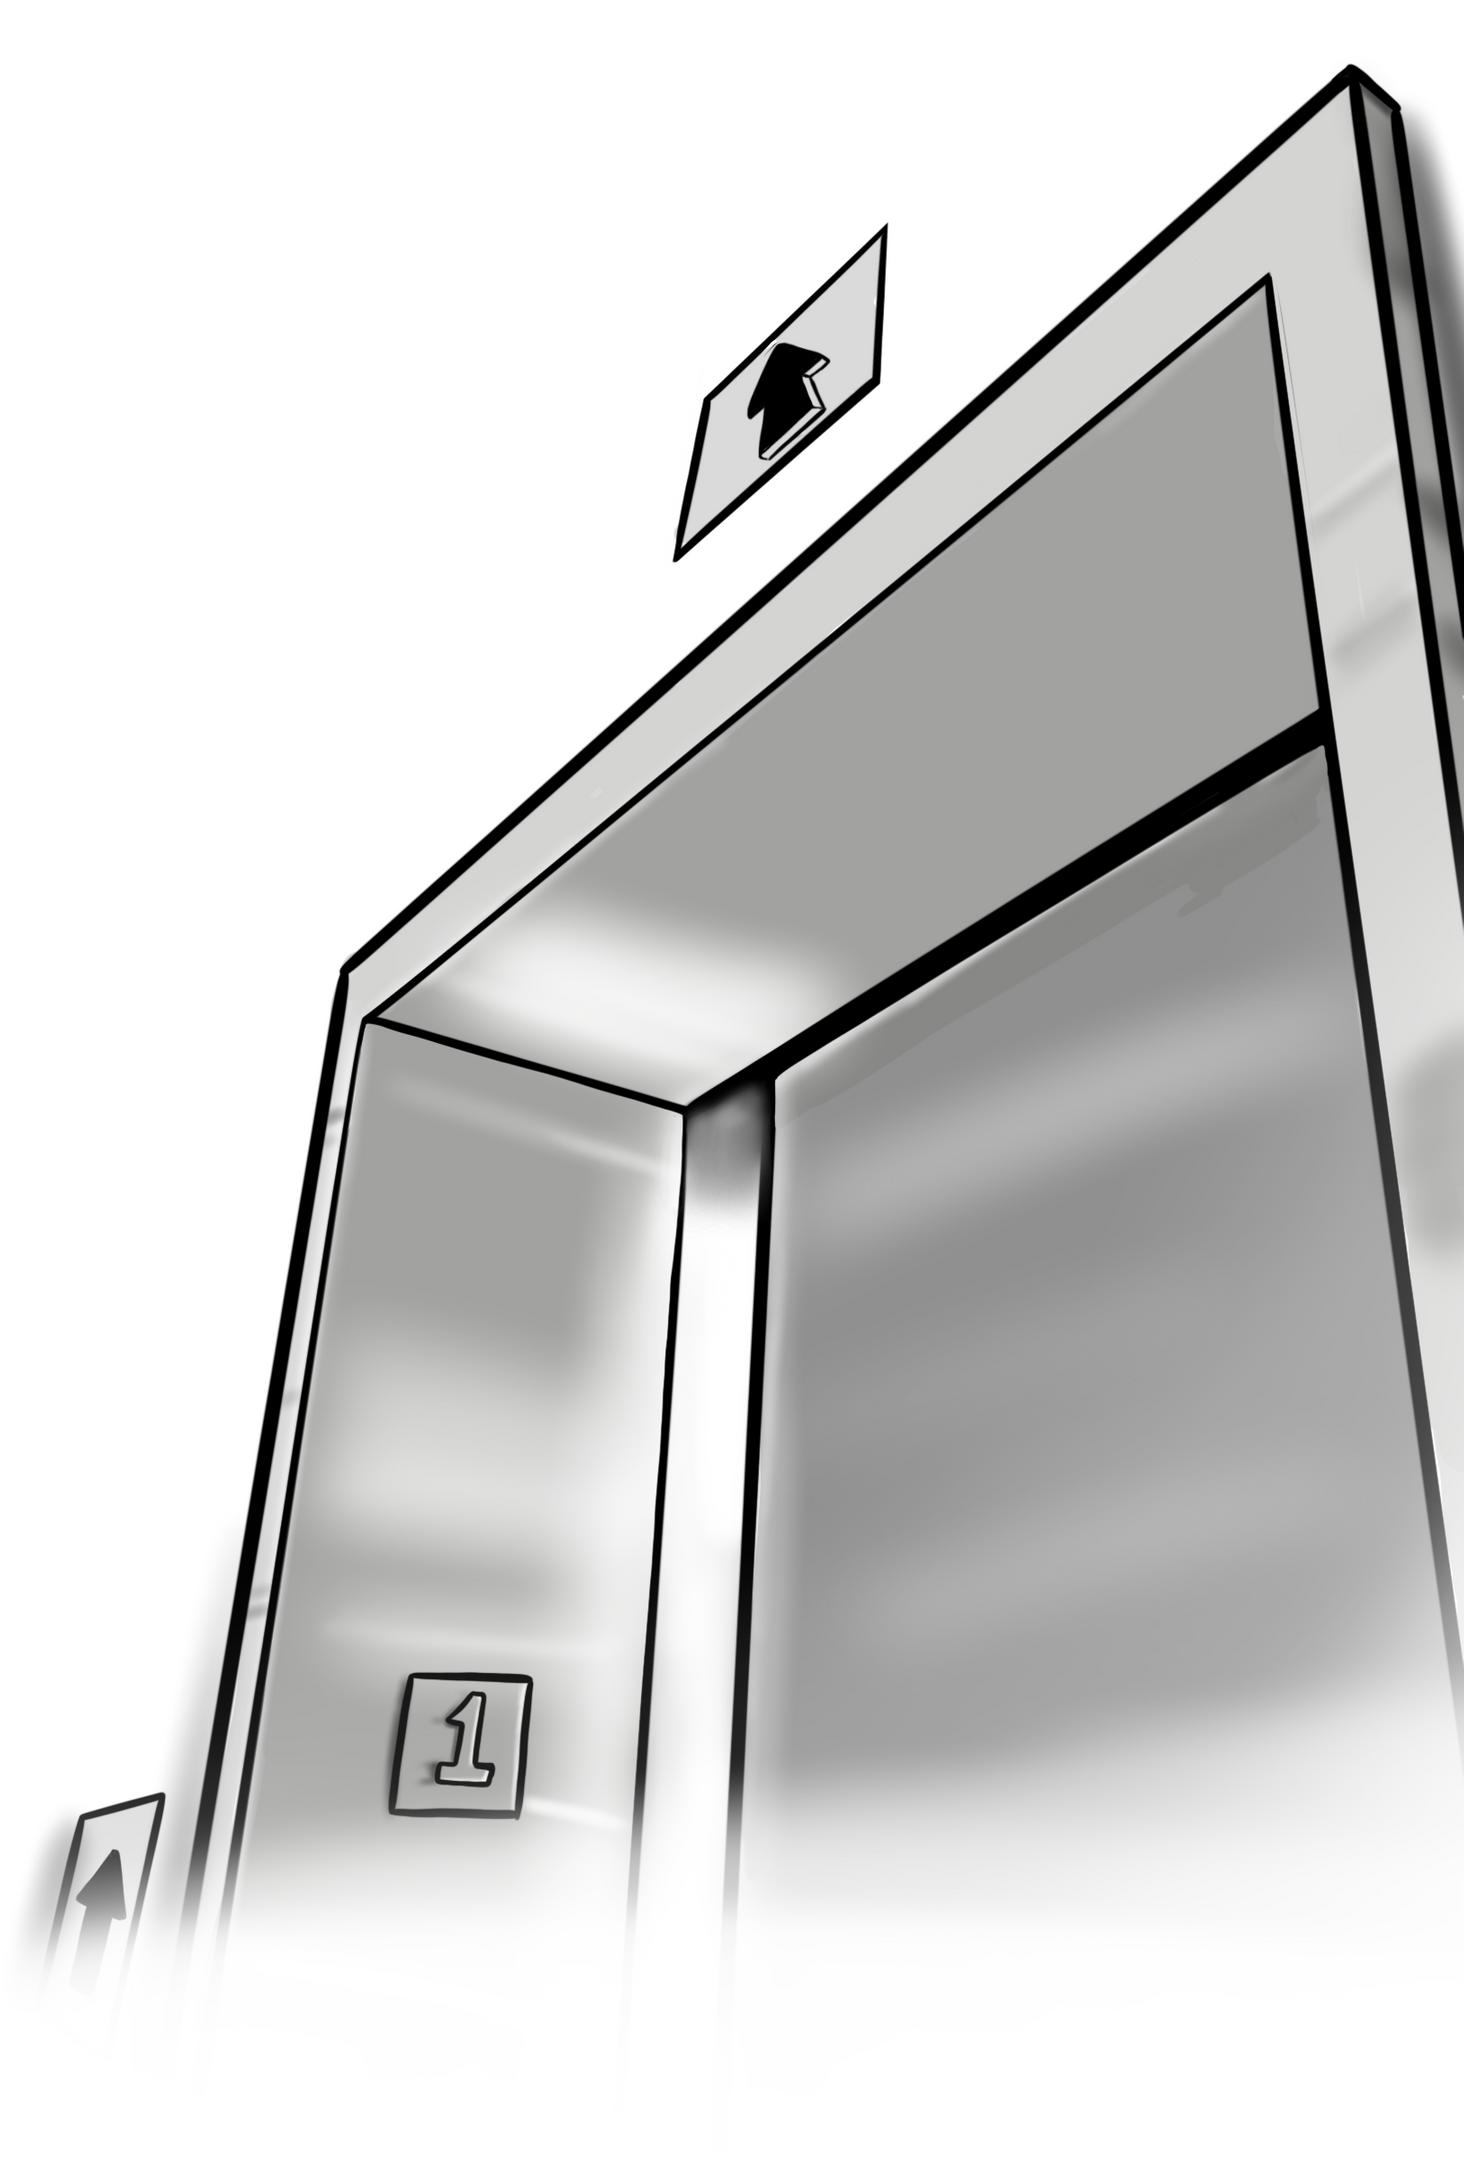 Elevator graphic